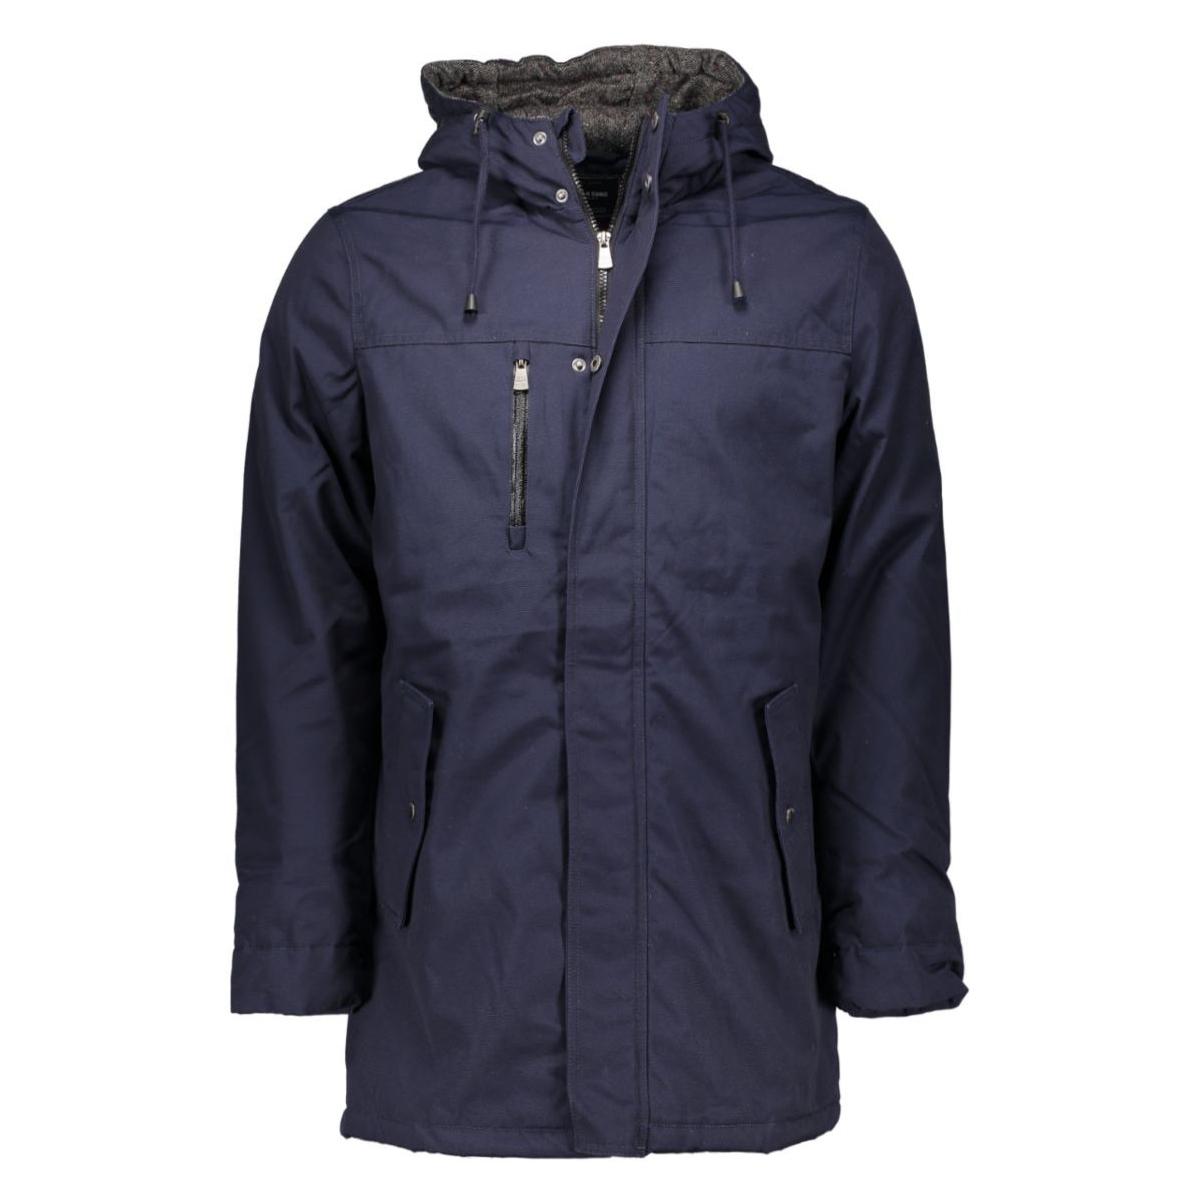 onssheldon jacket noos 22001584 only & sons jas night sky